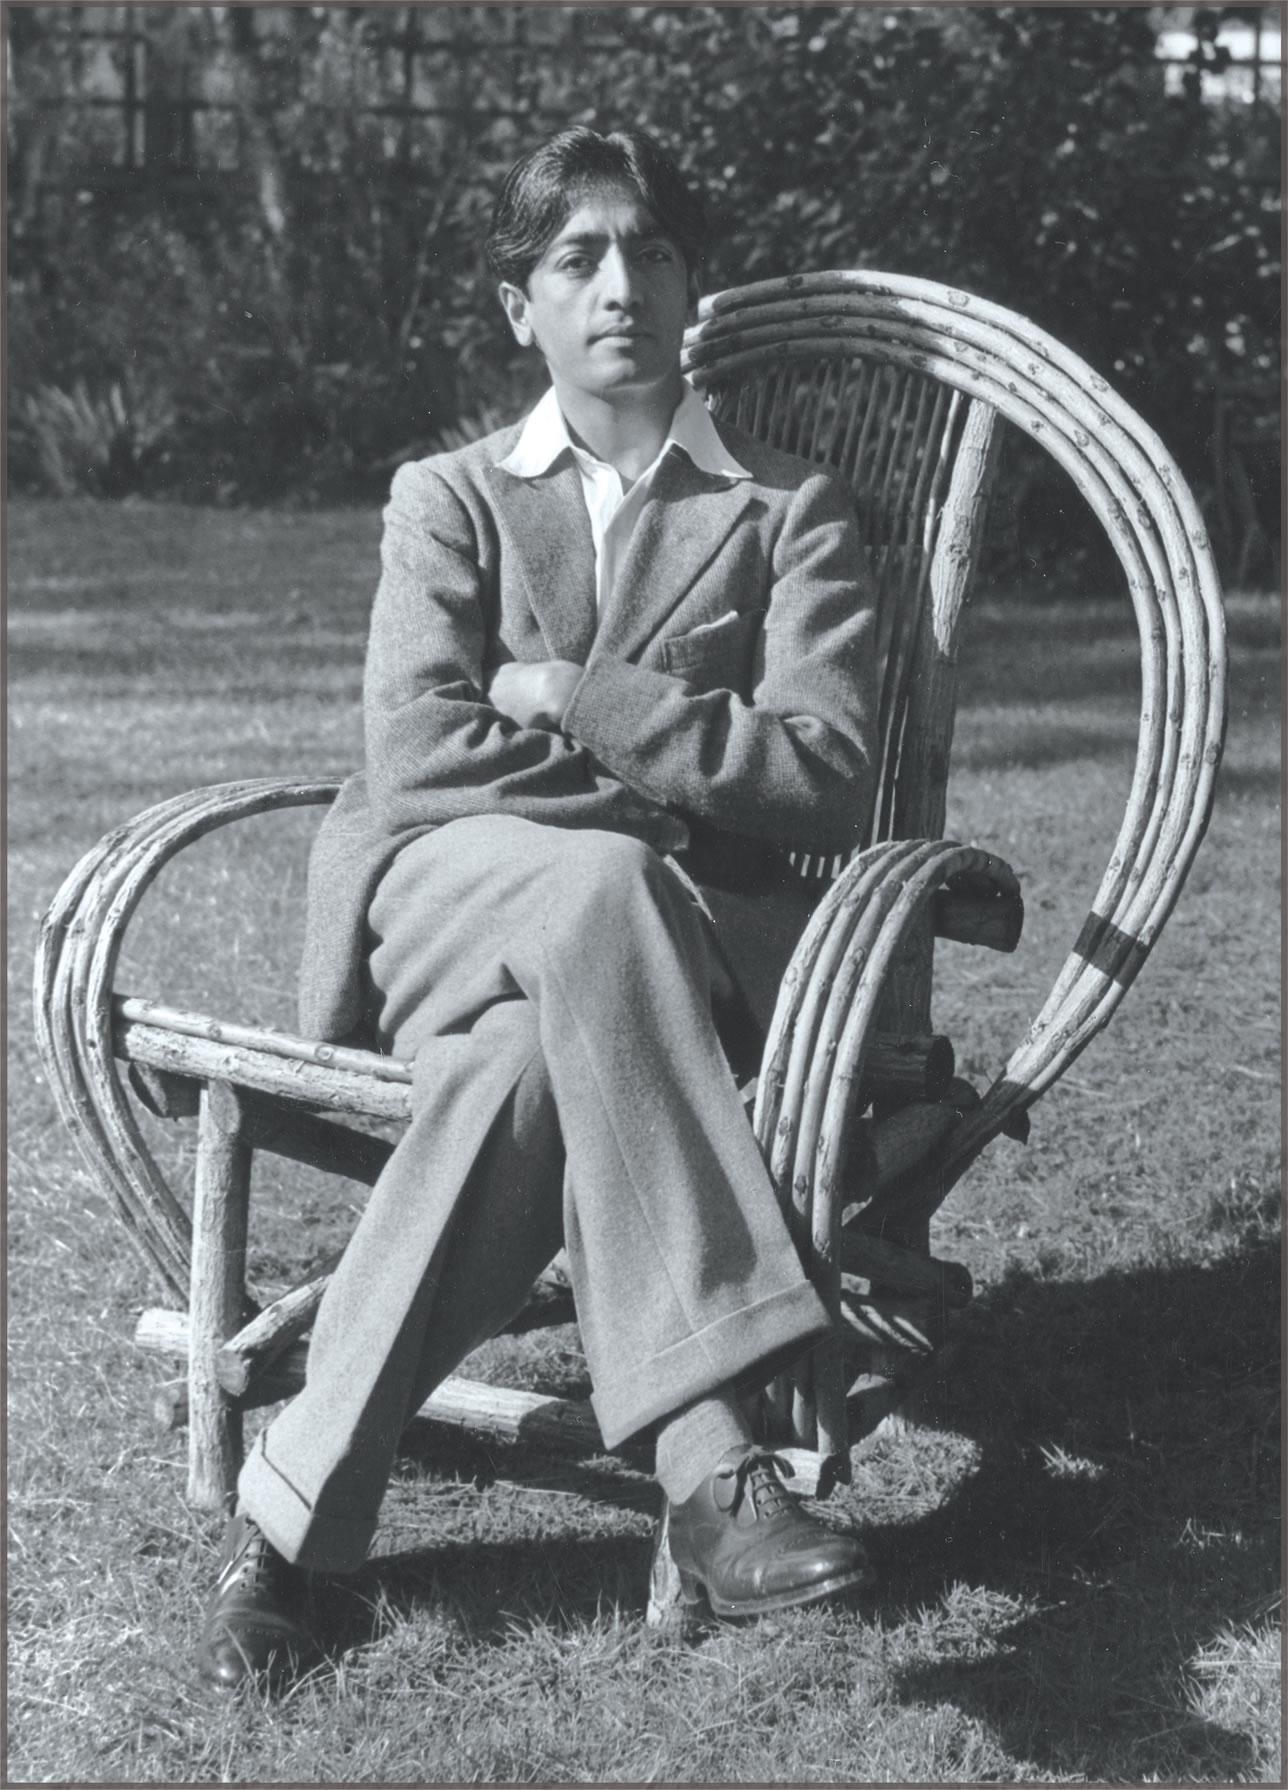 Photo: R. T. Gardner, Hollywood, 1935